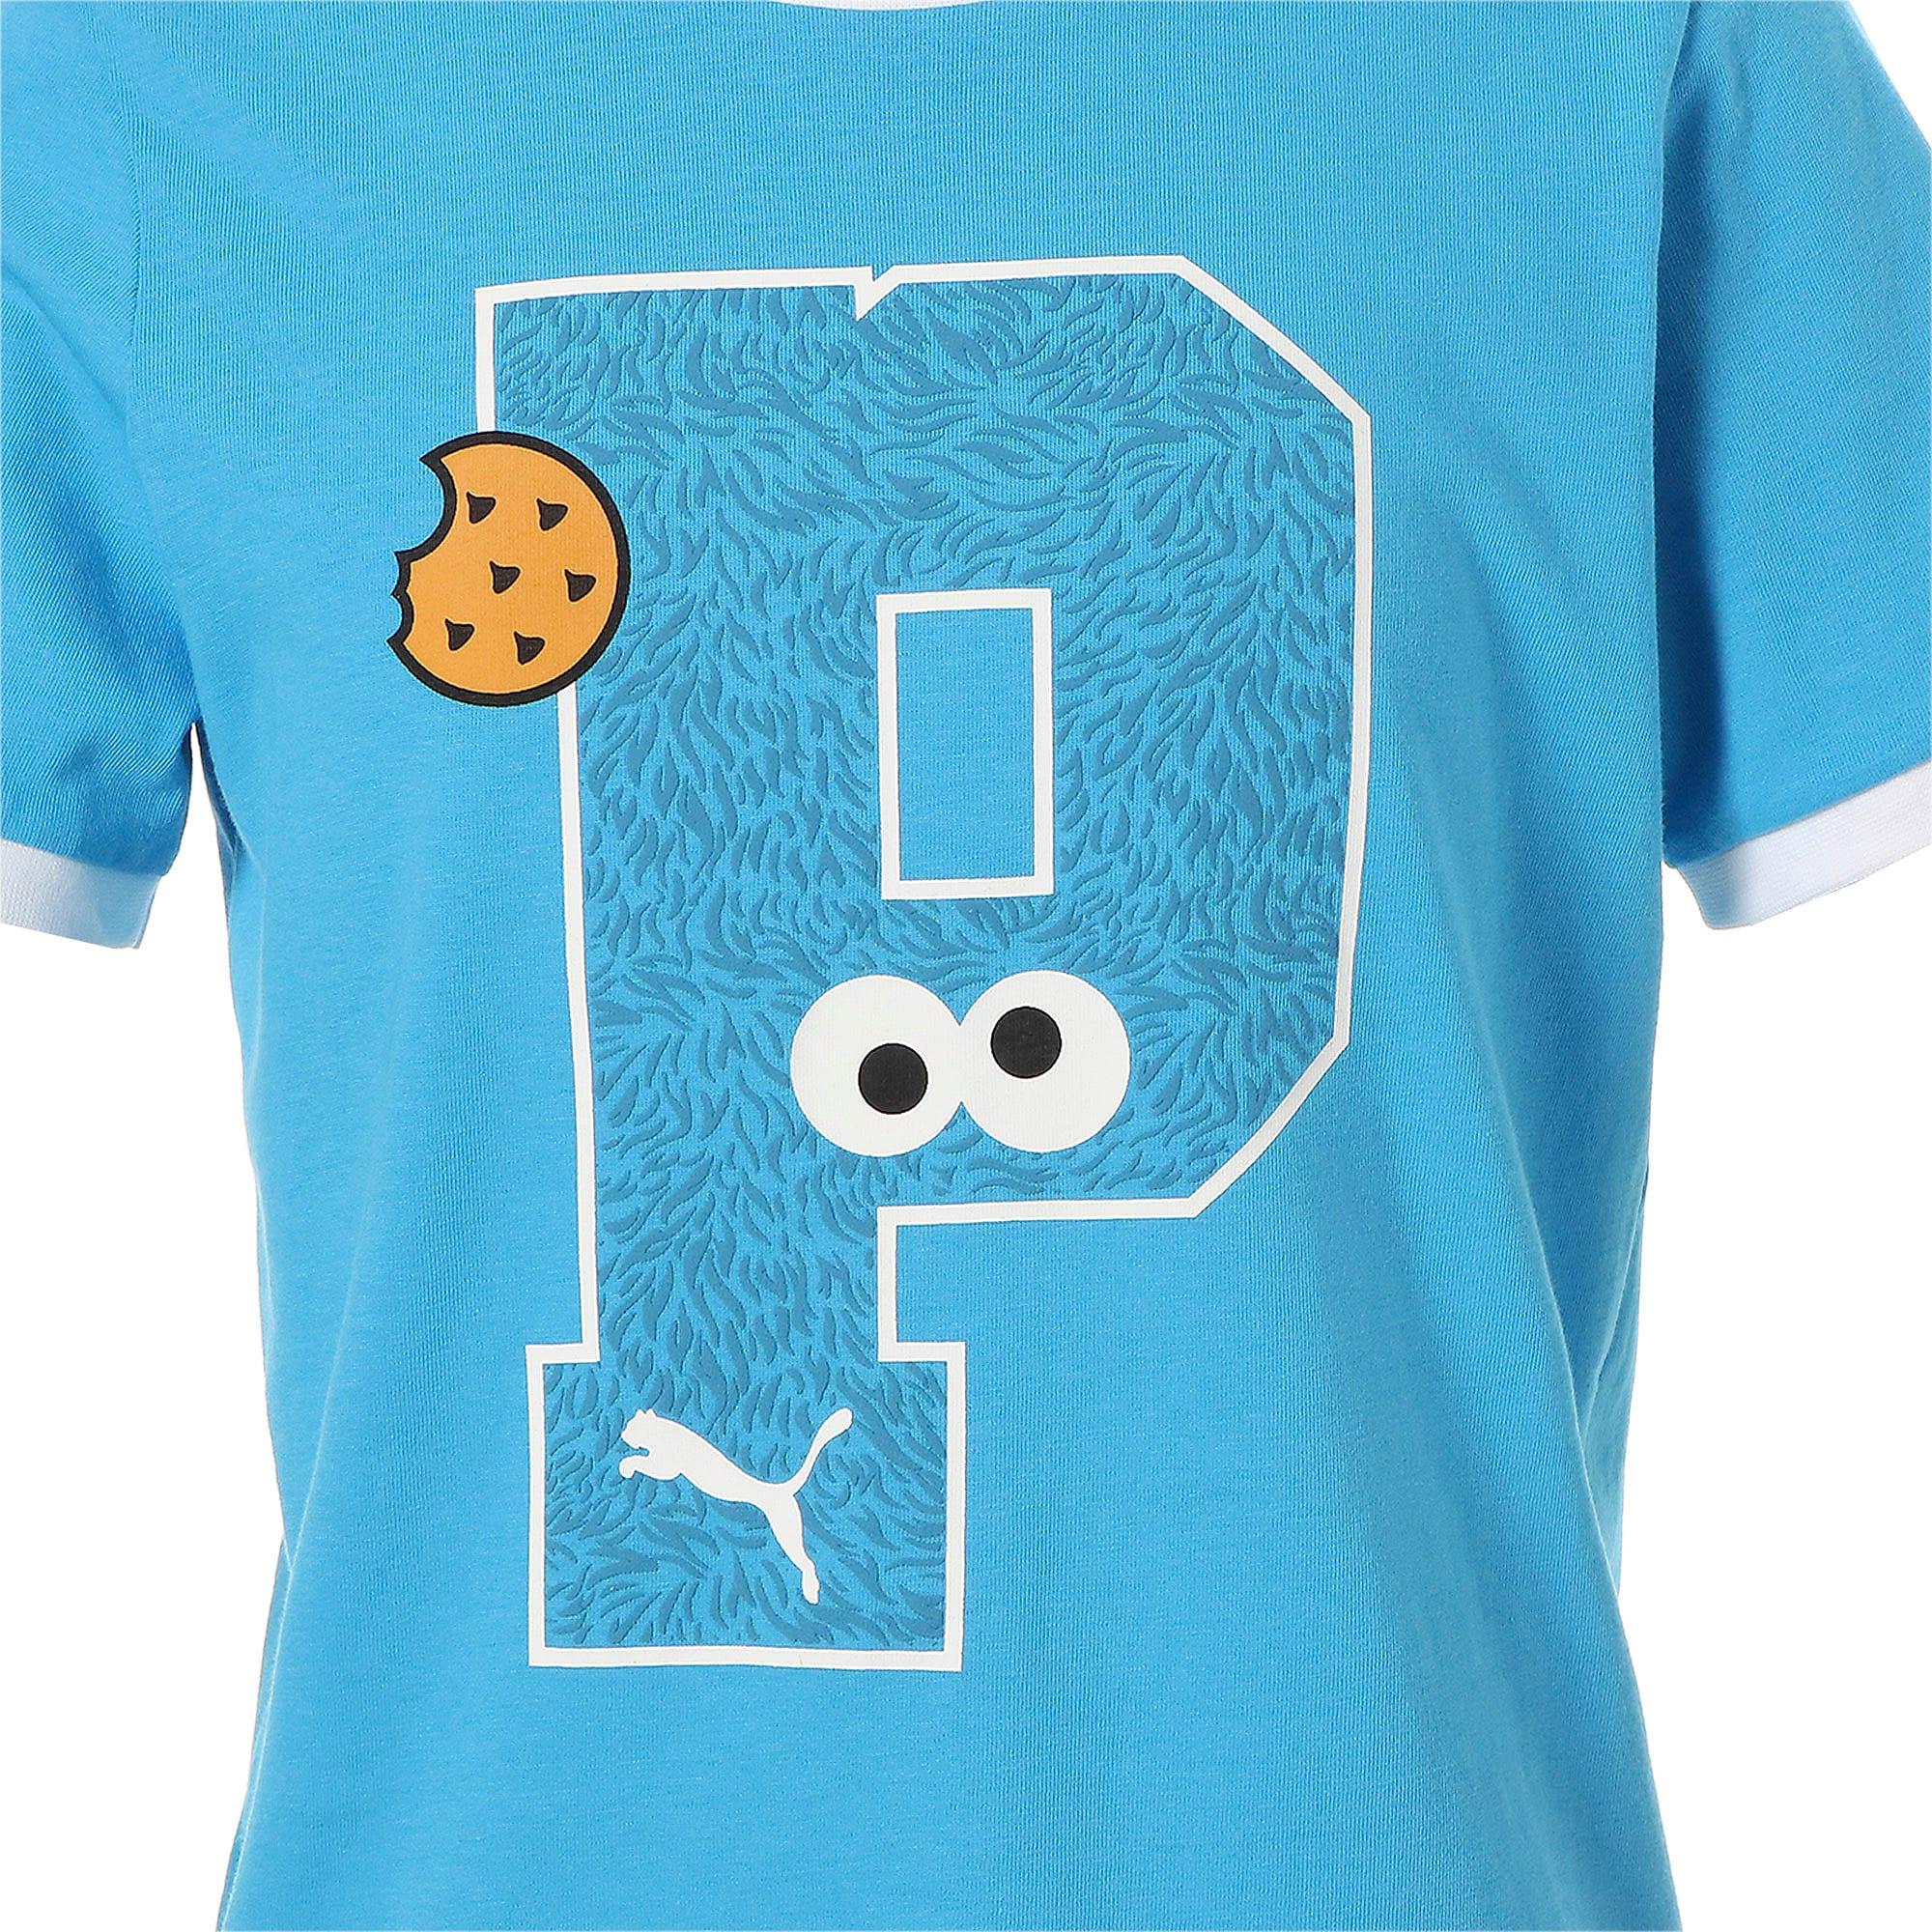 Thumbnail 7 of キッズ セサミストリート SS グラフィック Tシャツ (半袖), Bleu Azur, medium-JPN